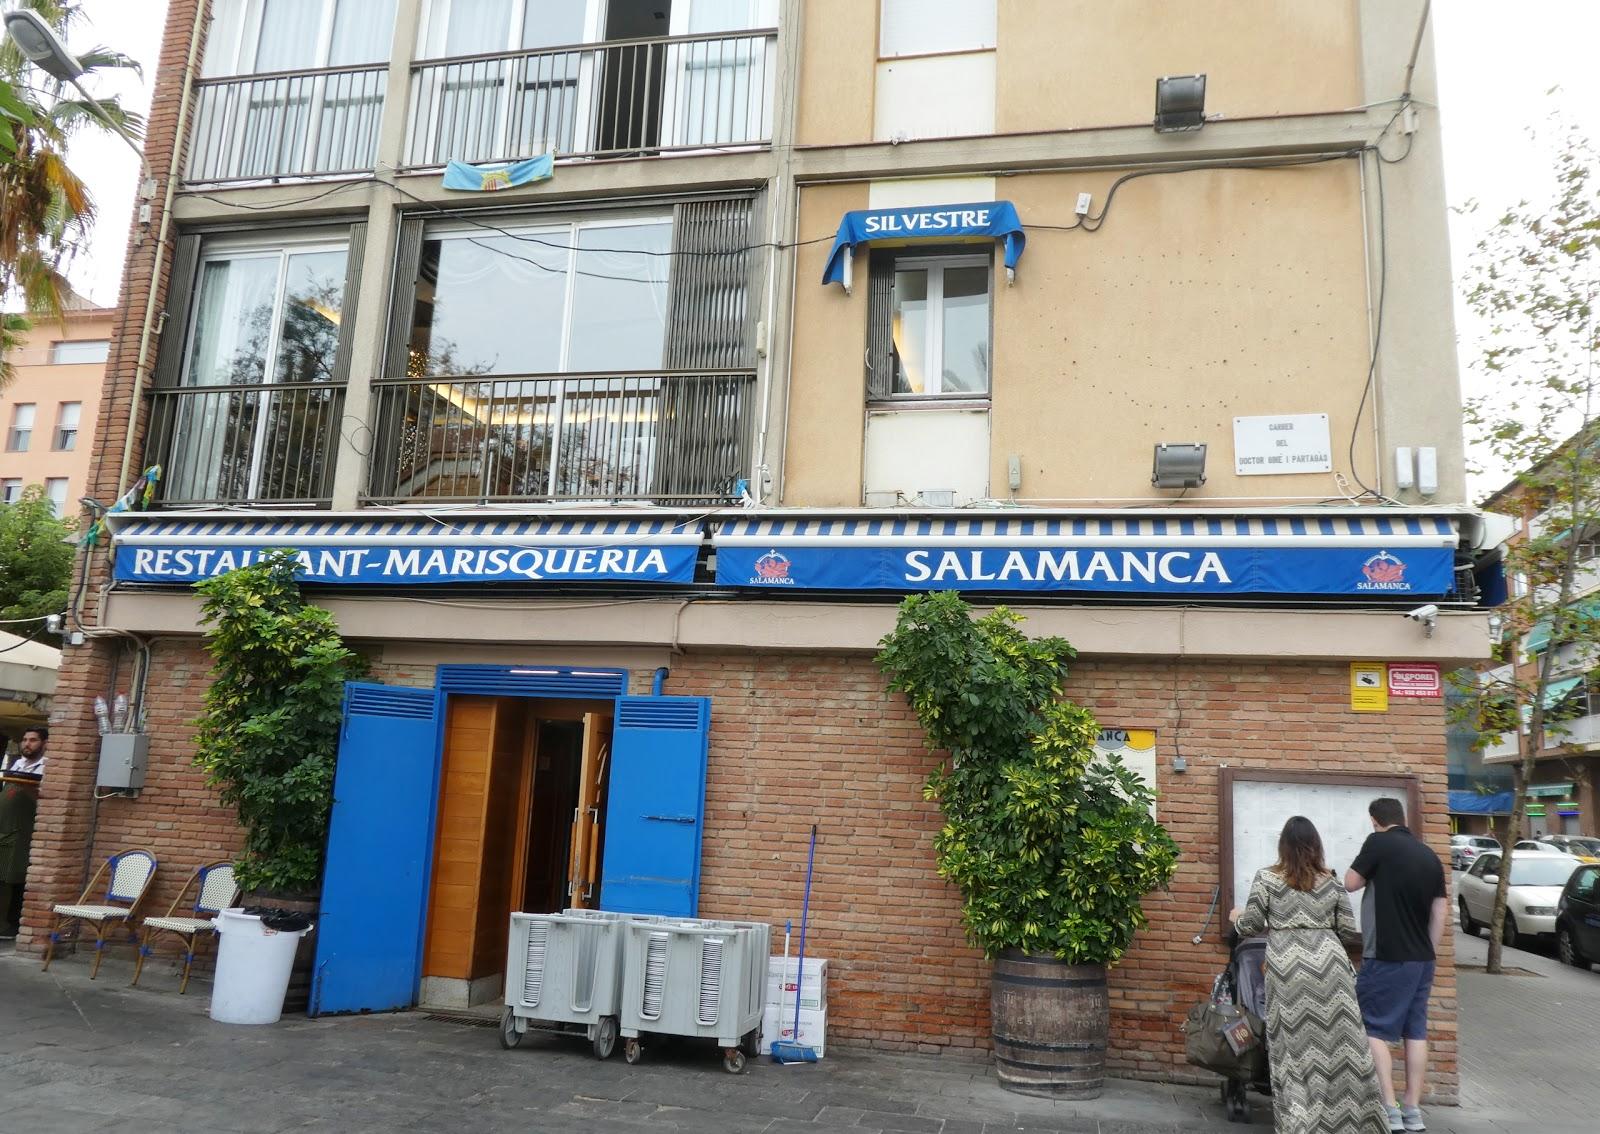 Restaurant Salamanca